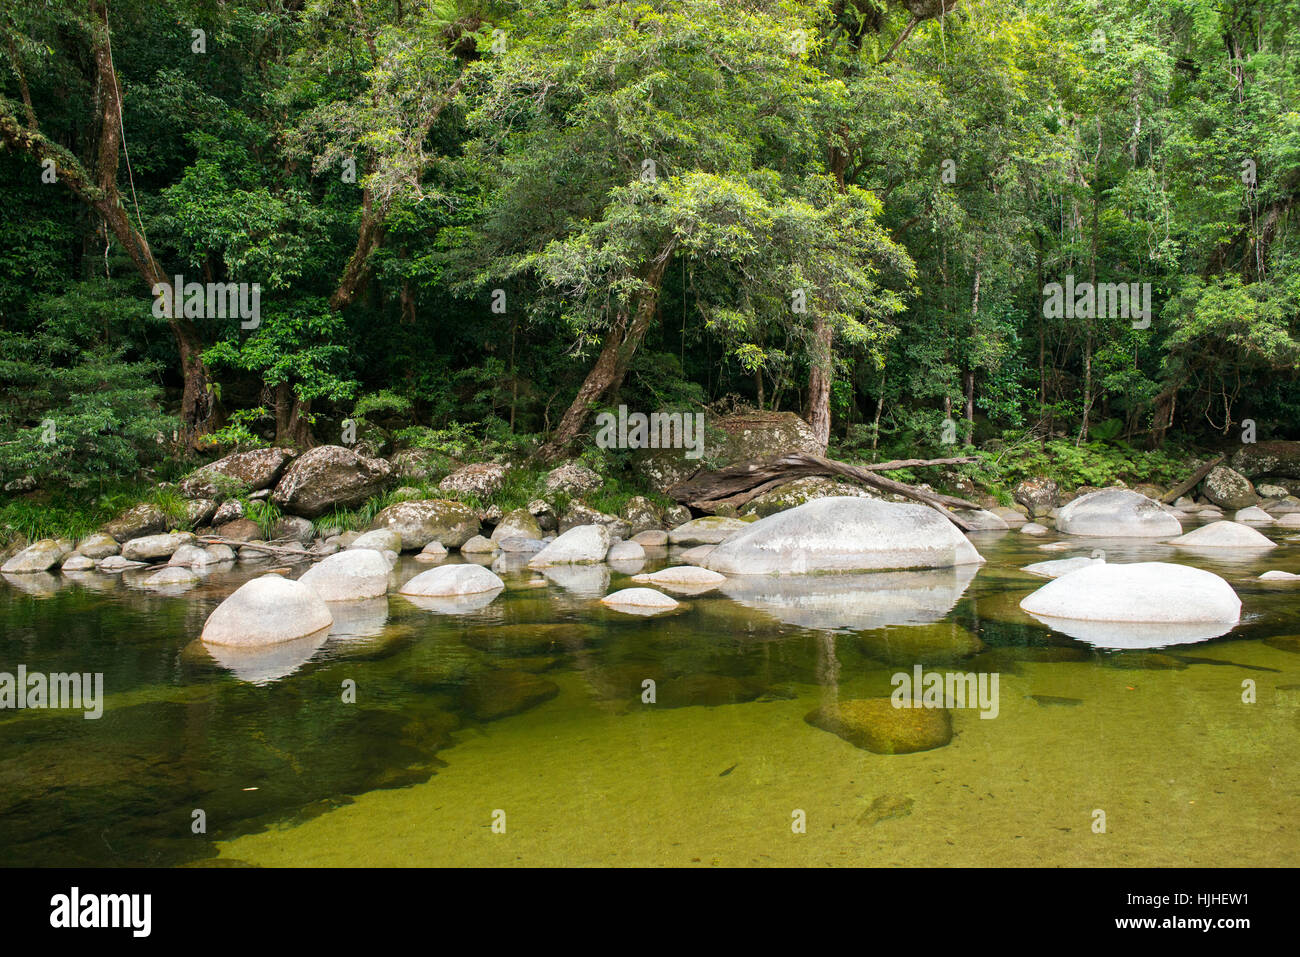 Mossman Gorge, Queensland Australia - Stock Image